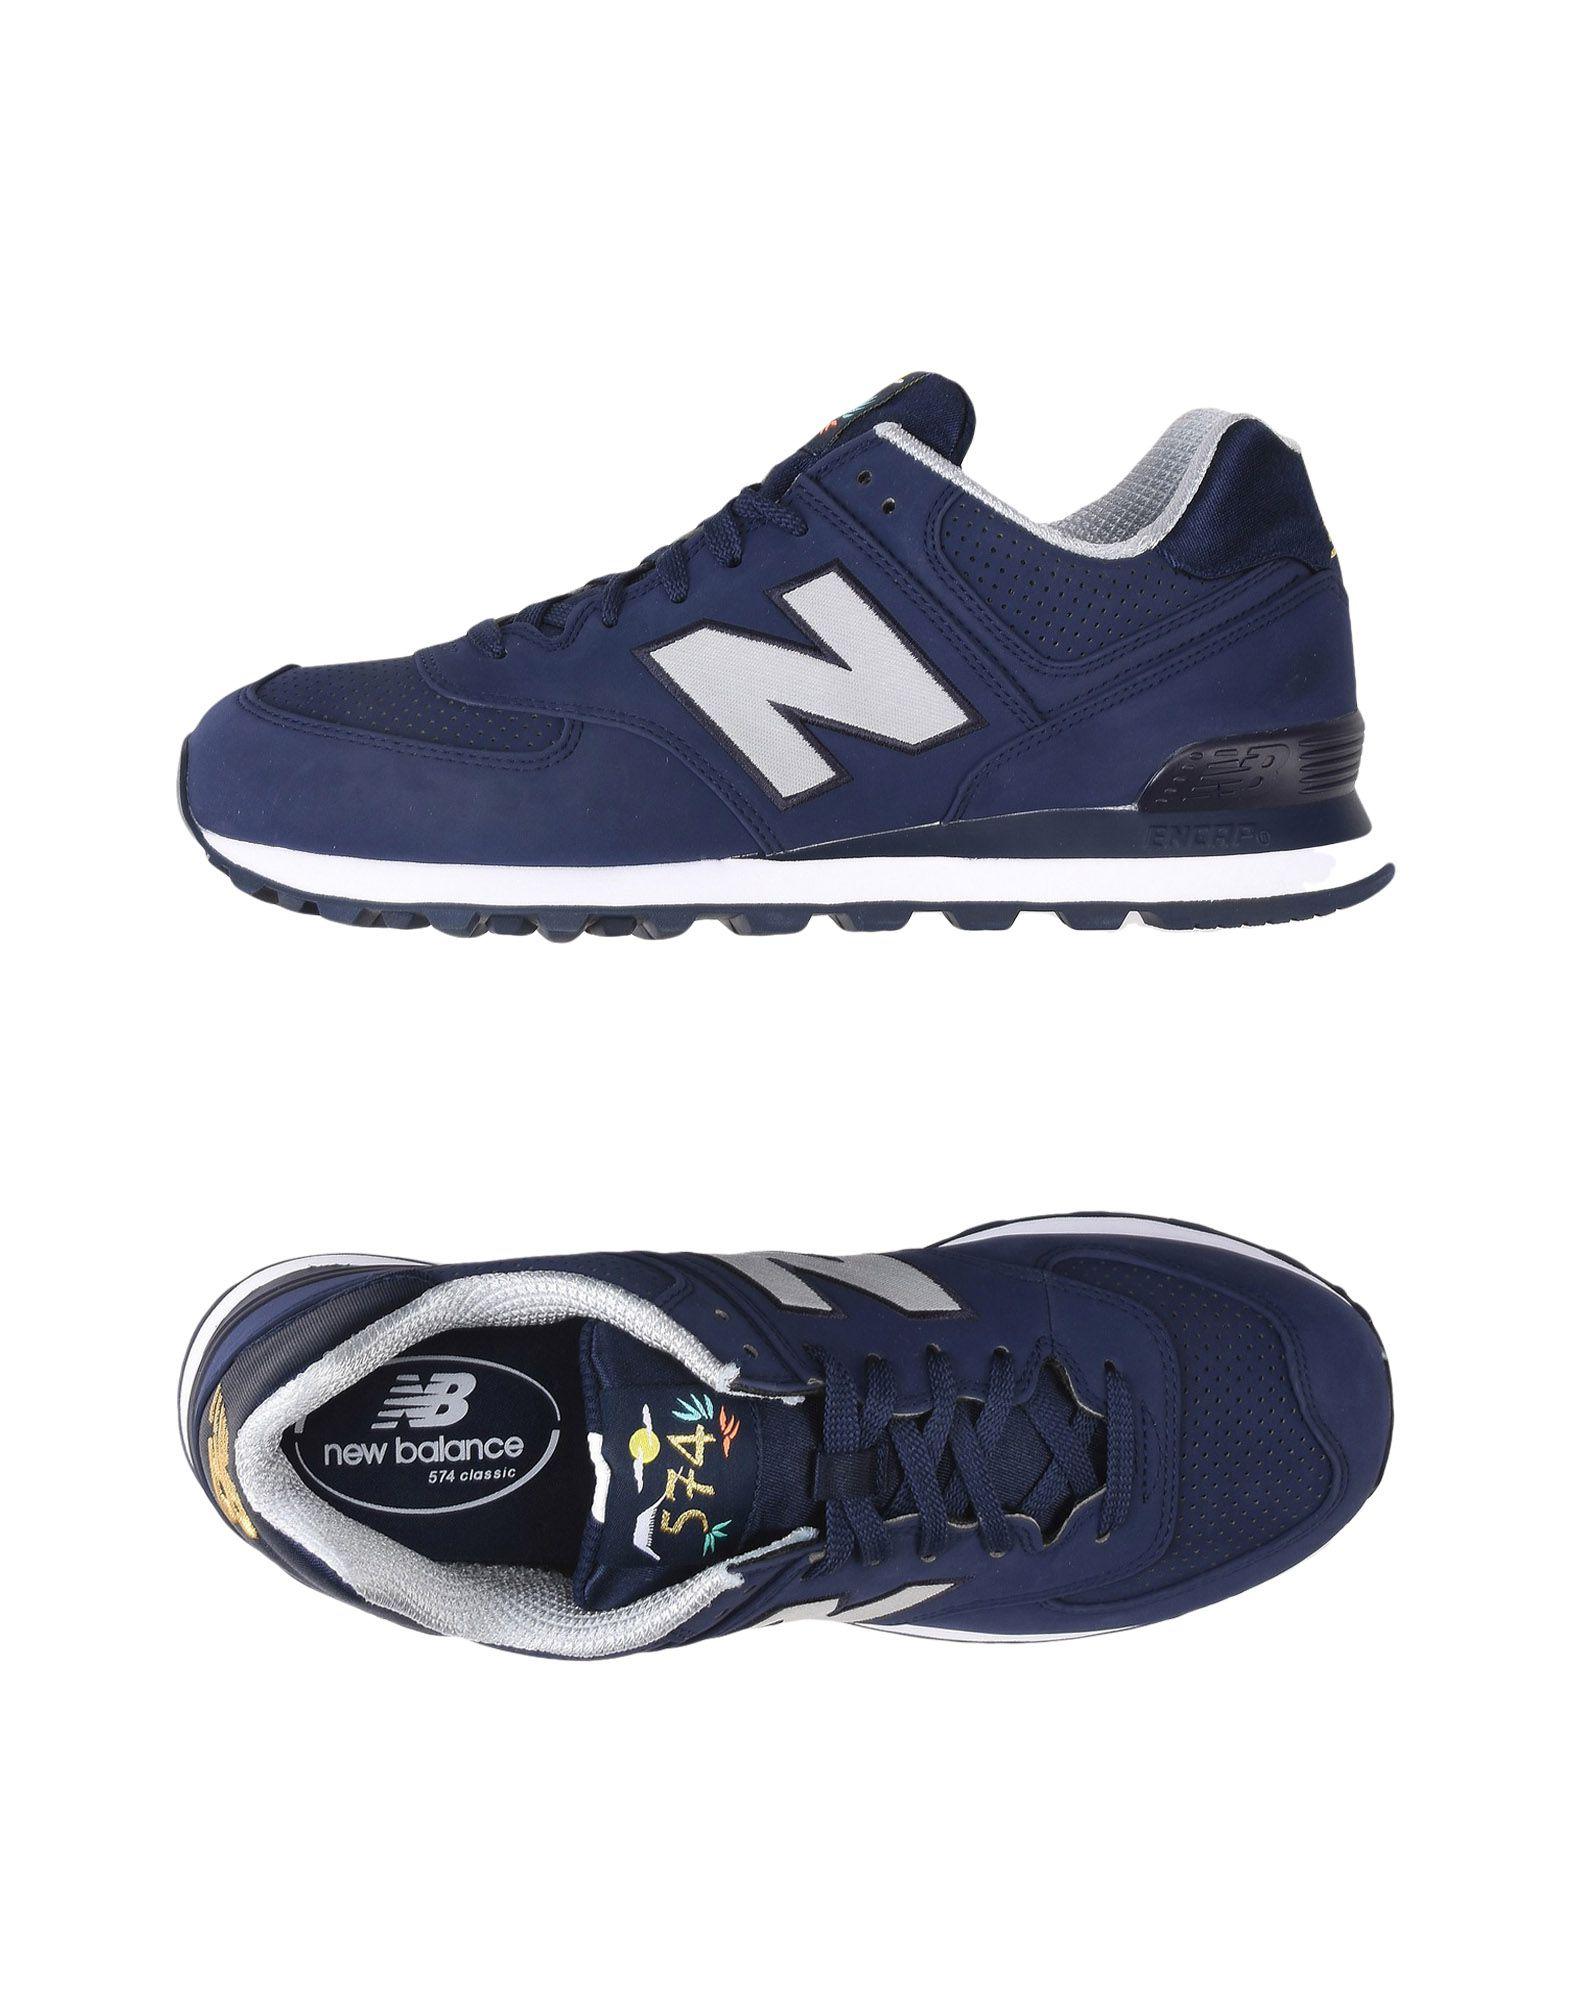 Sneakers New Balance 574 Winter Nubuck - Uomo - 11393119HB